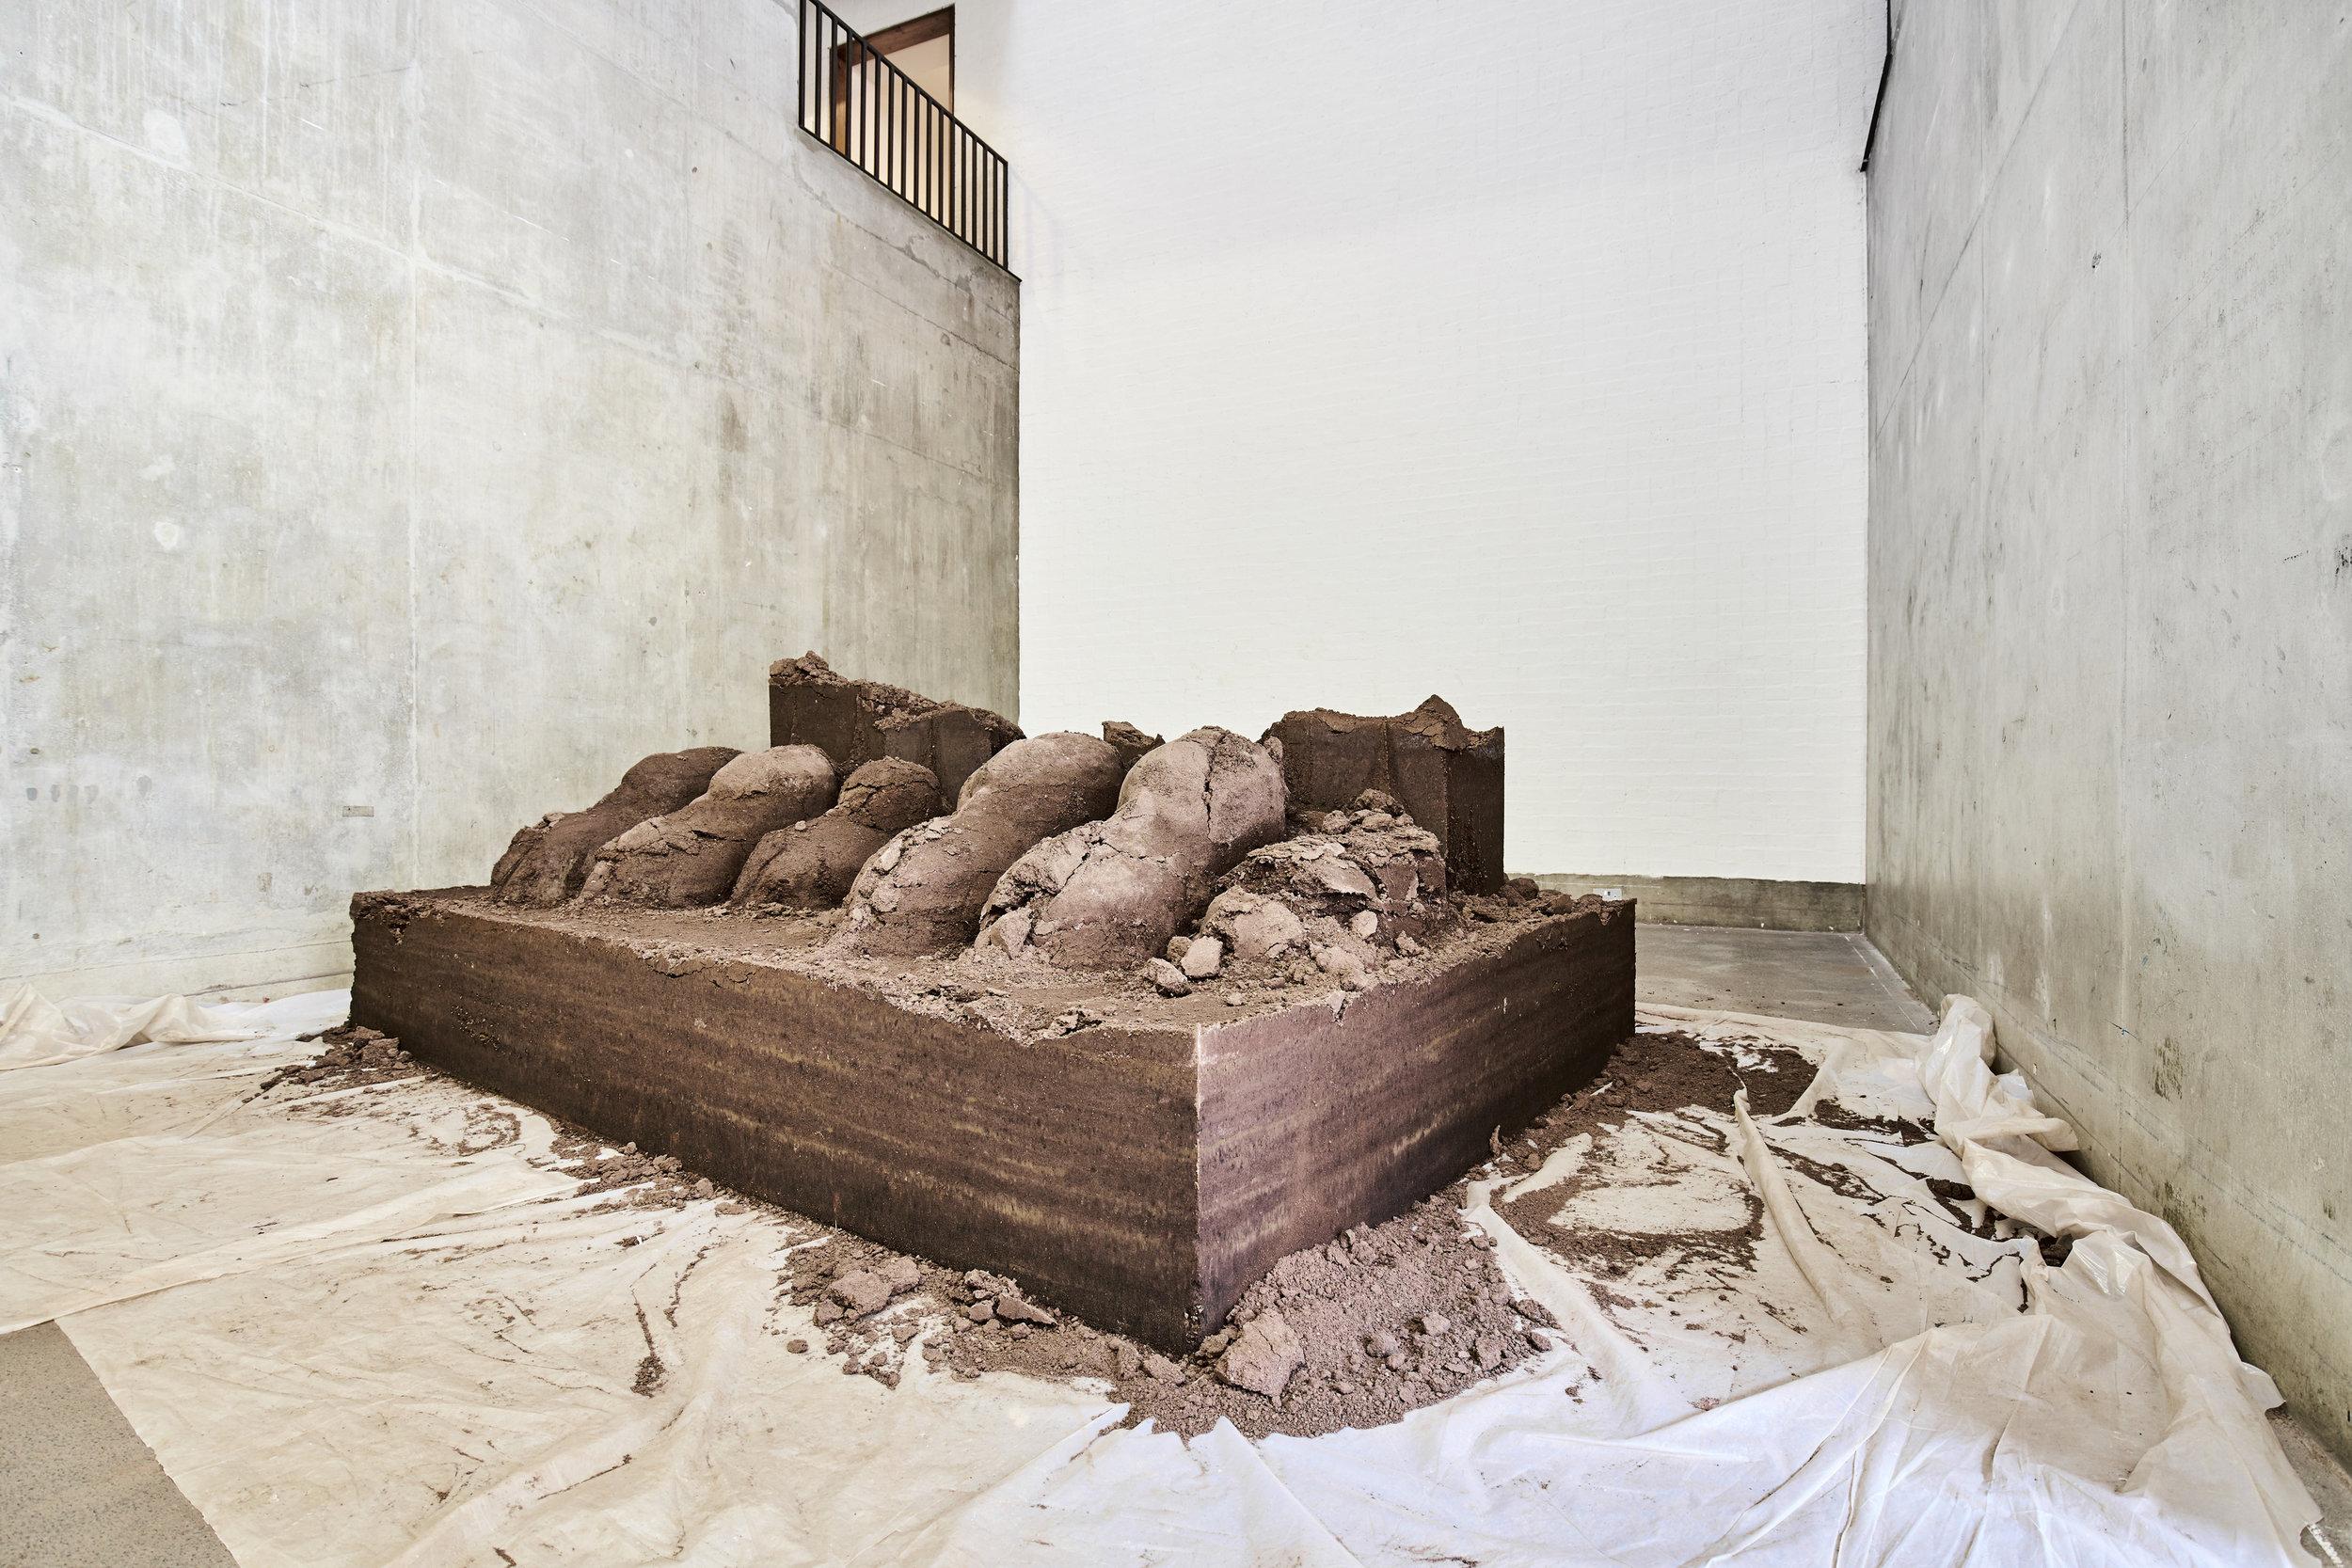 Abbas Akhavan, Variations on Ghost, 2017–2018